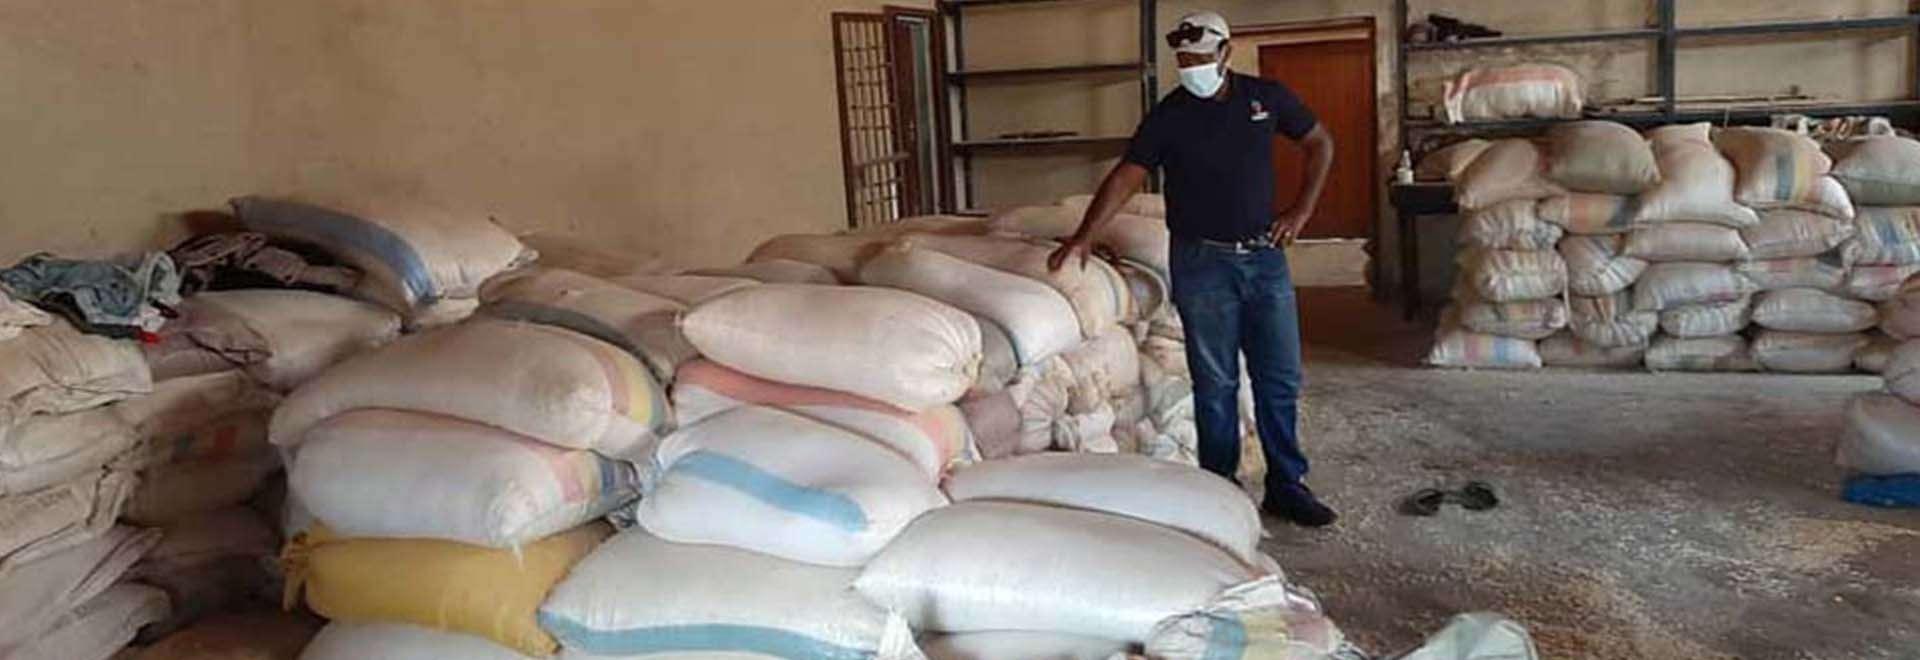 Igreja Cristã Maranata doa alimentos para famílias no Malawi, país africano